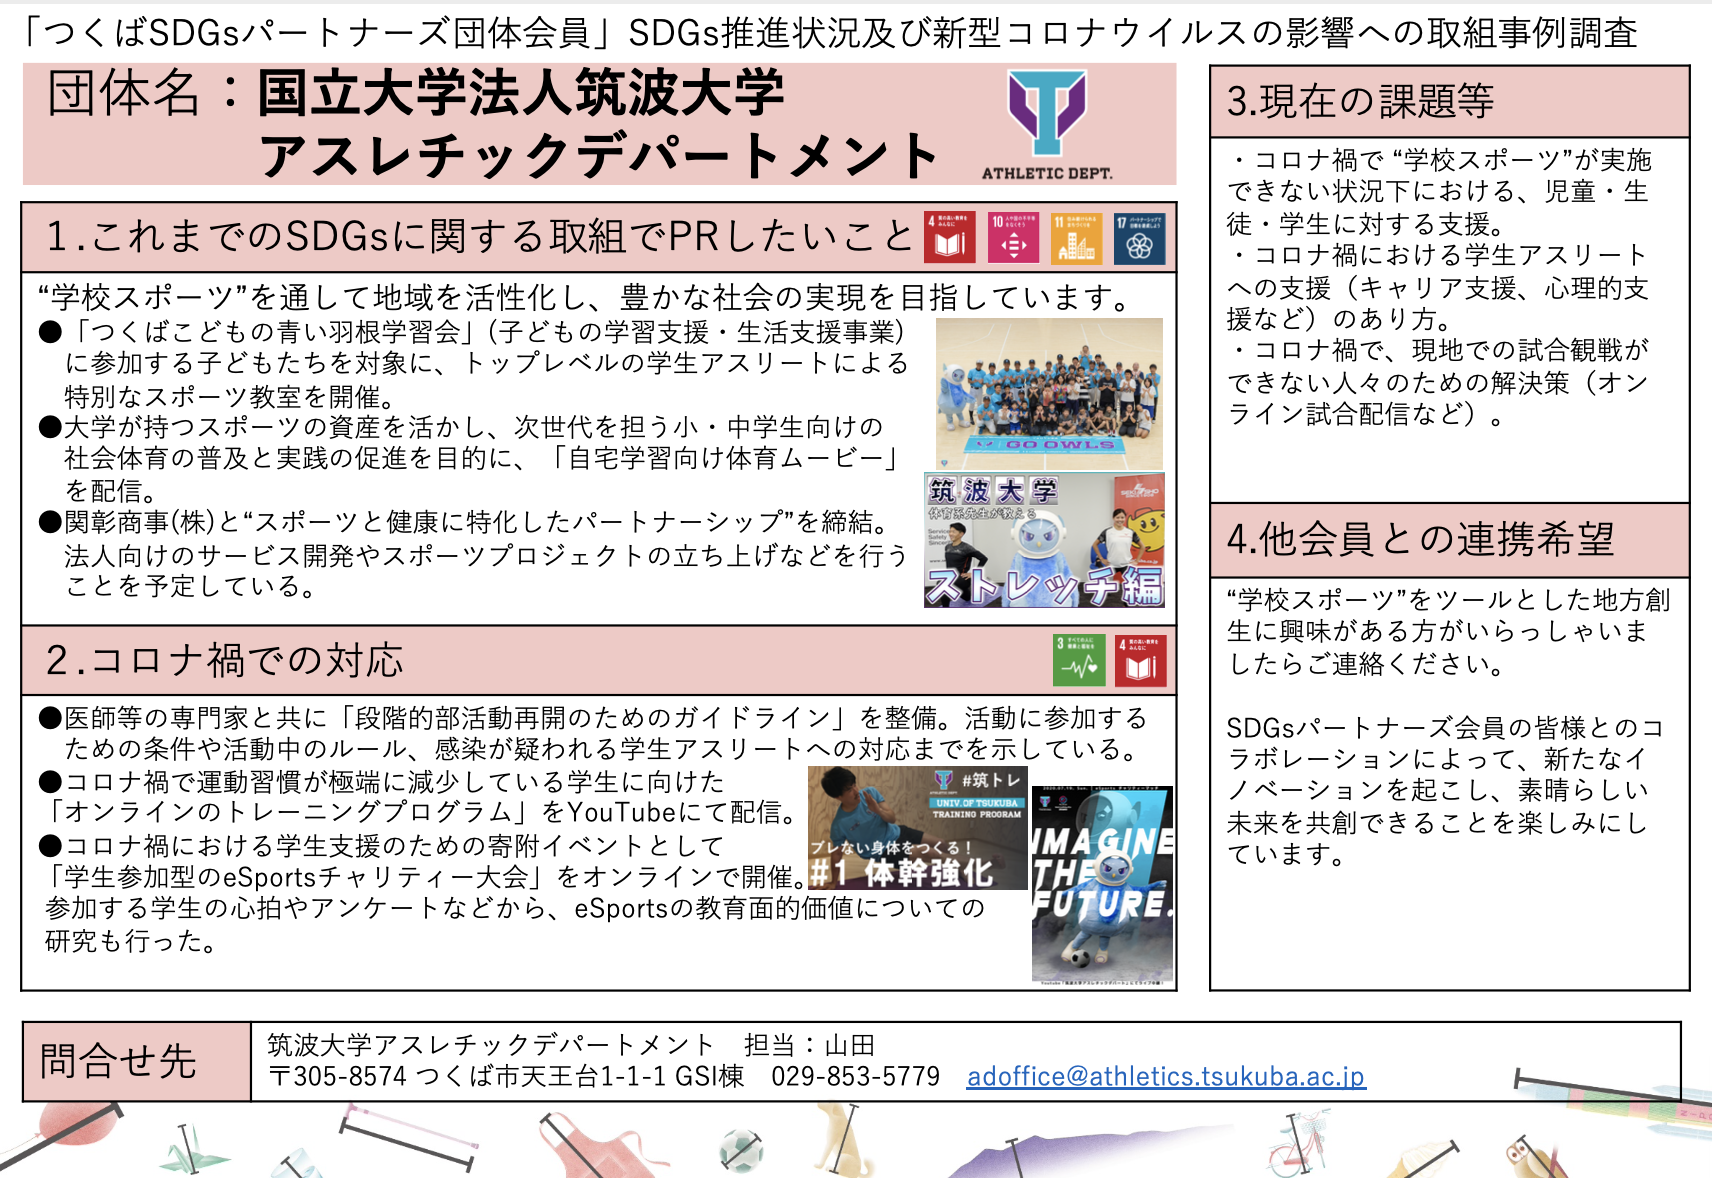 50筑波大学AD